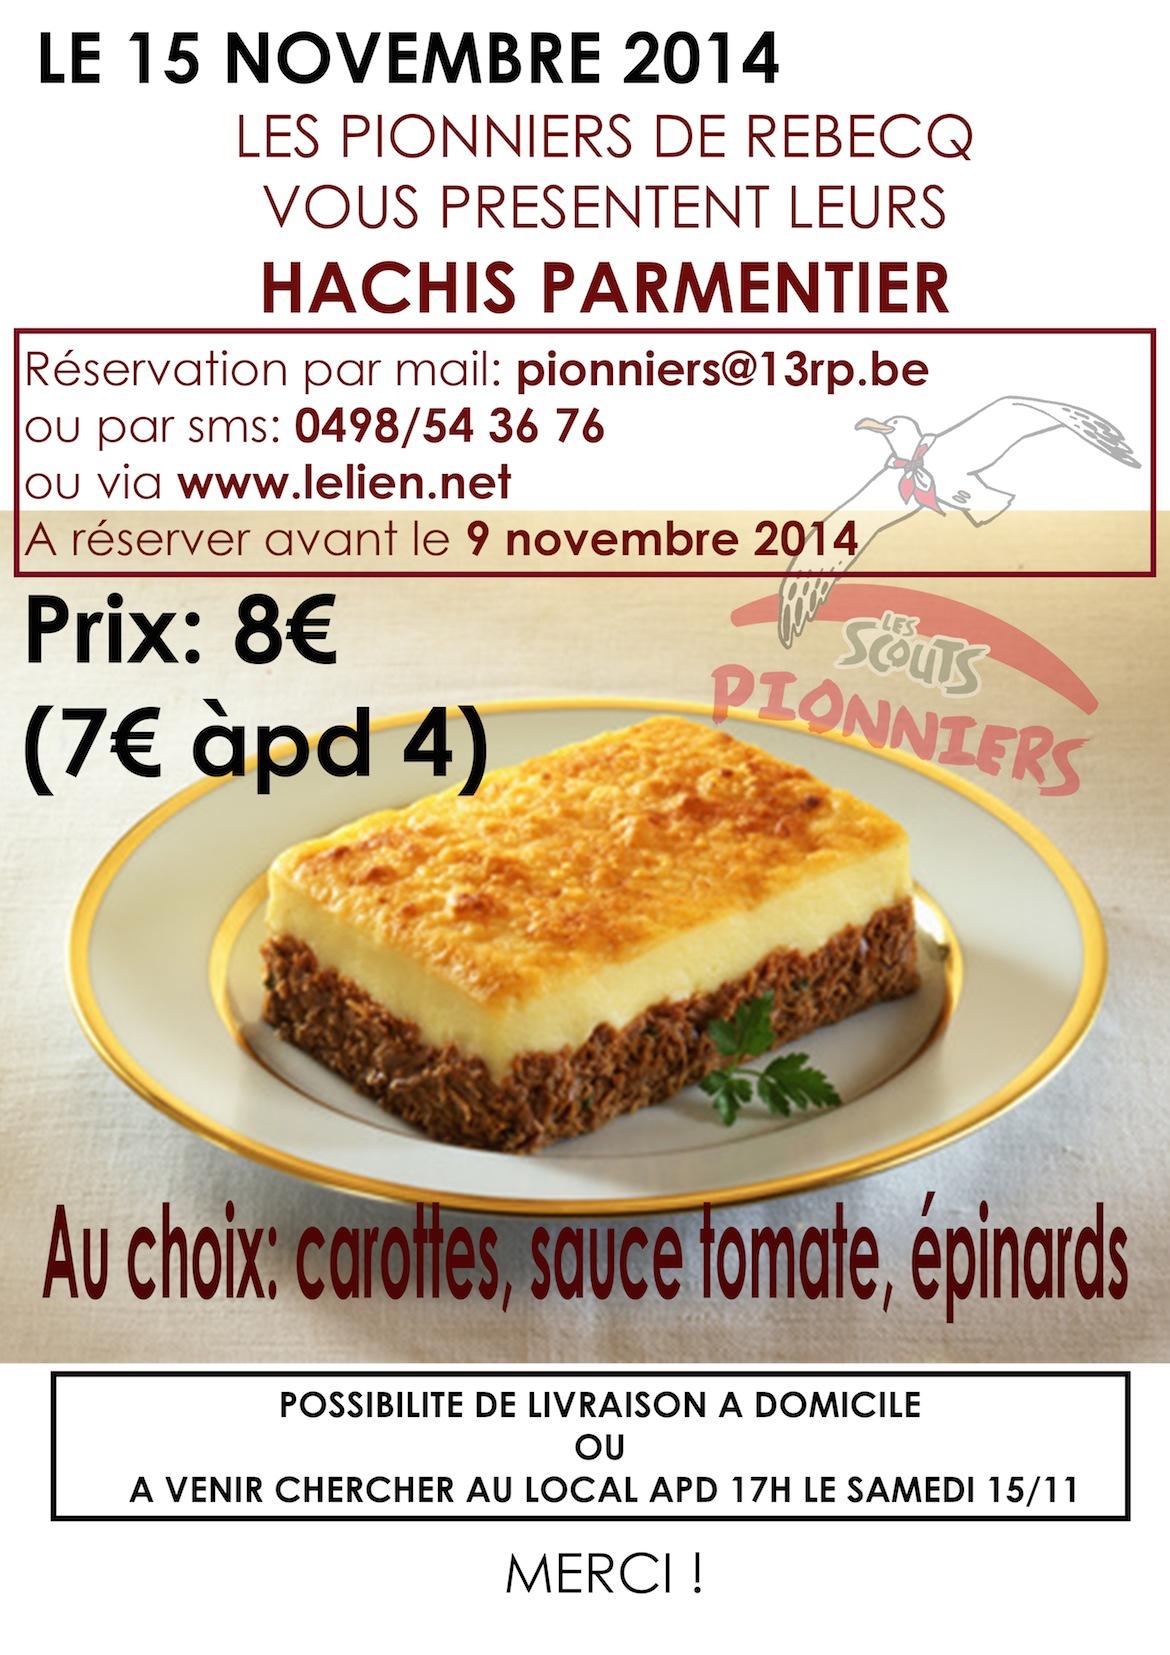 Hachis2014